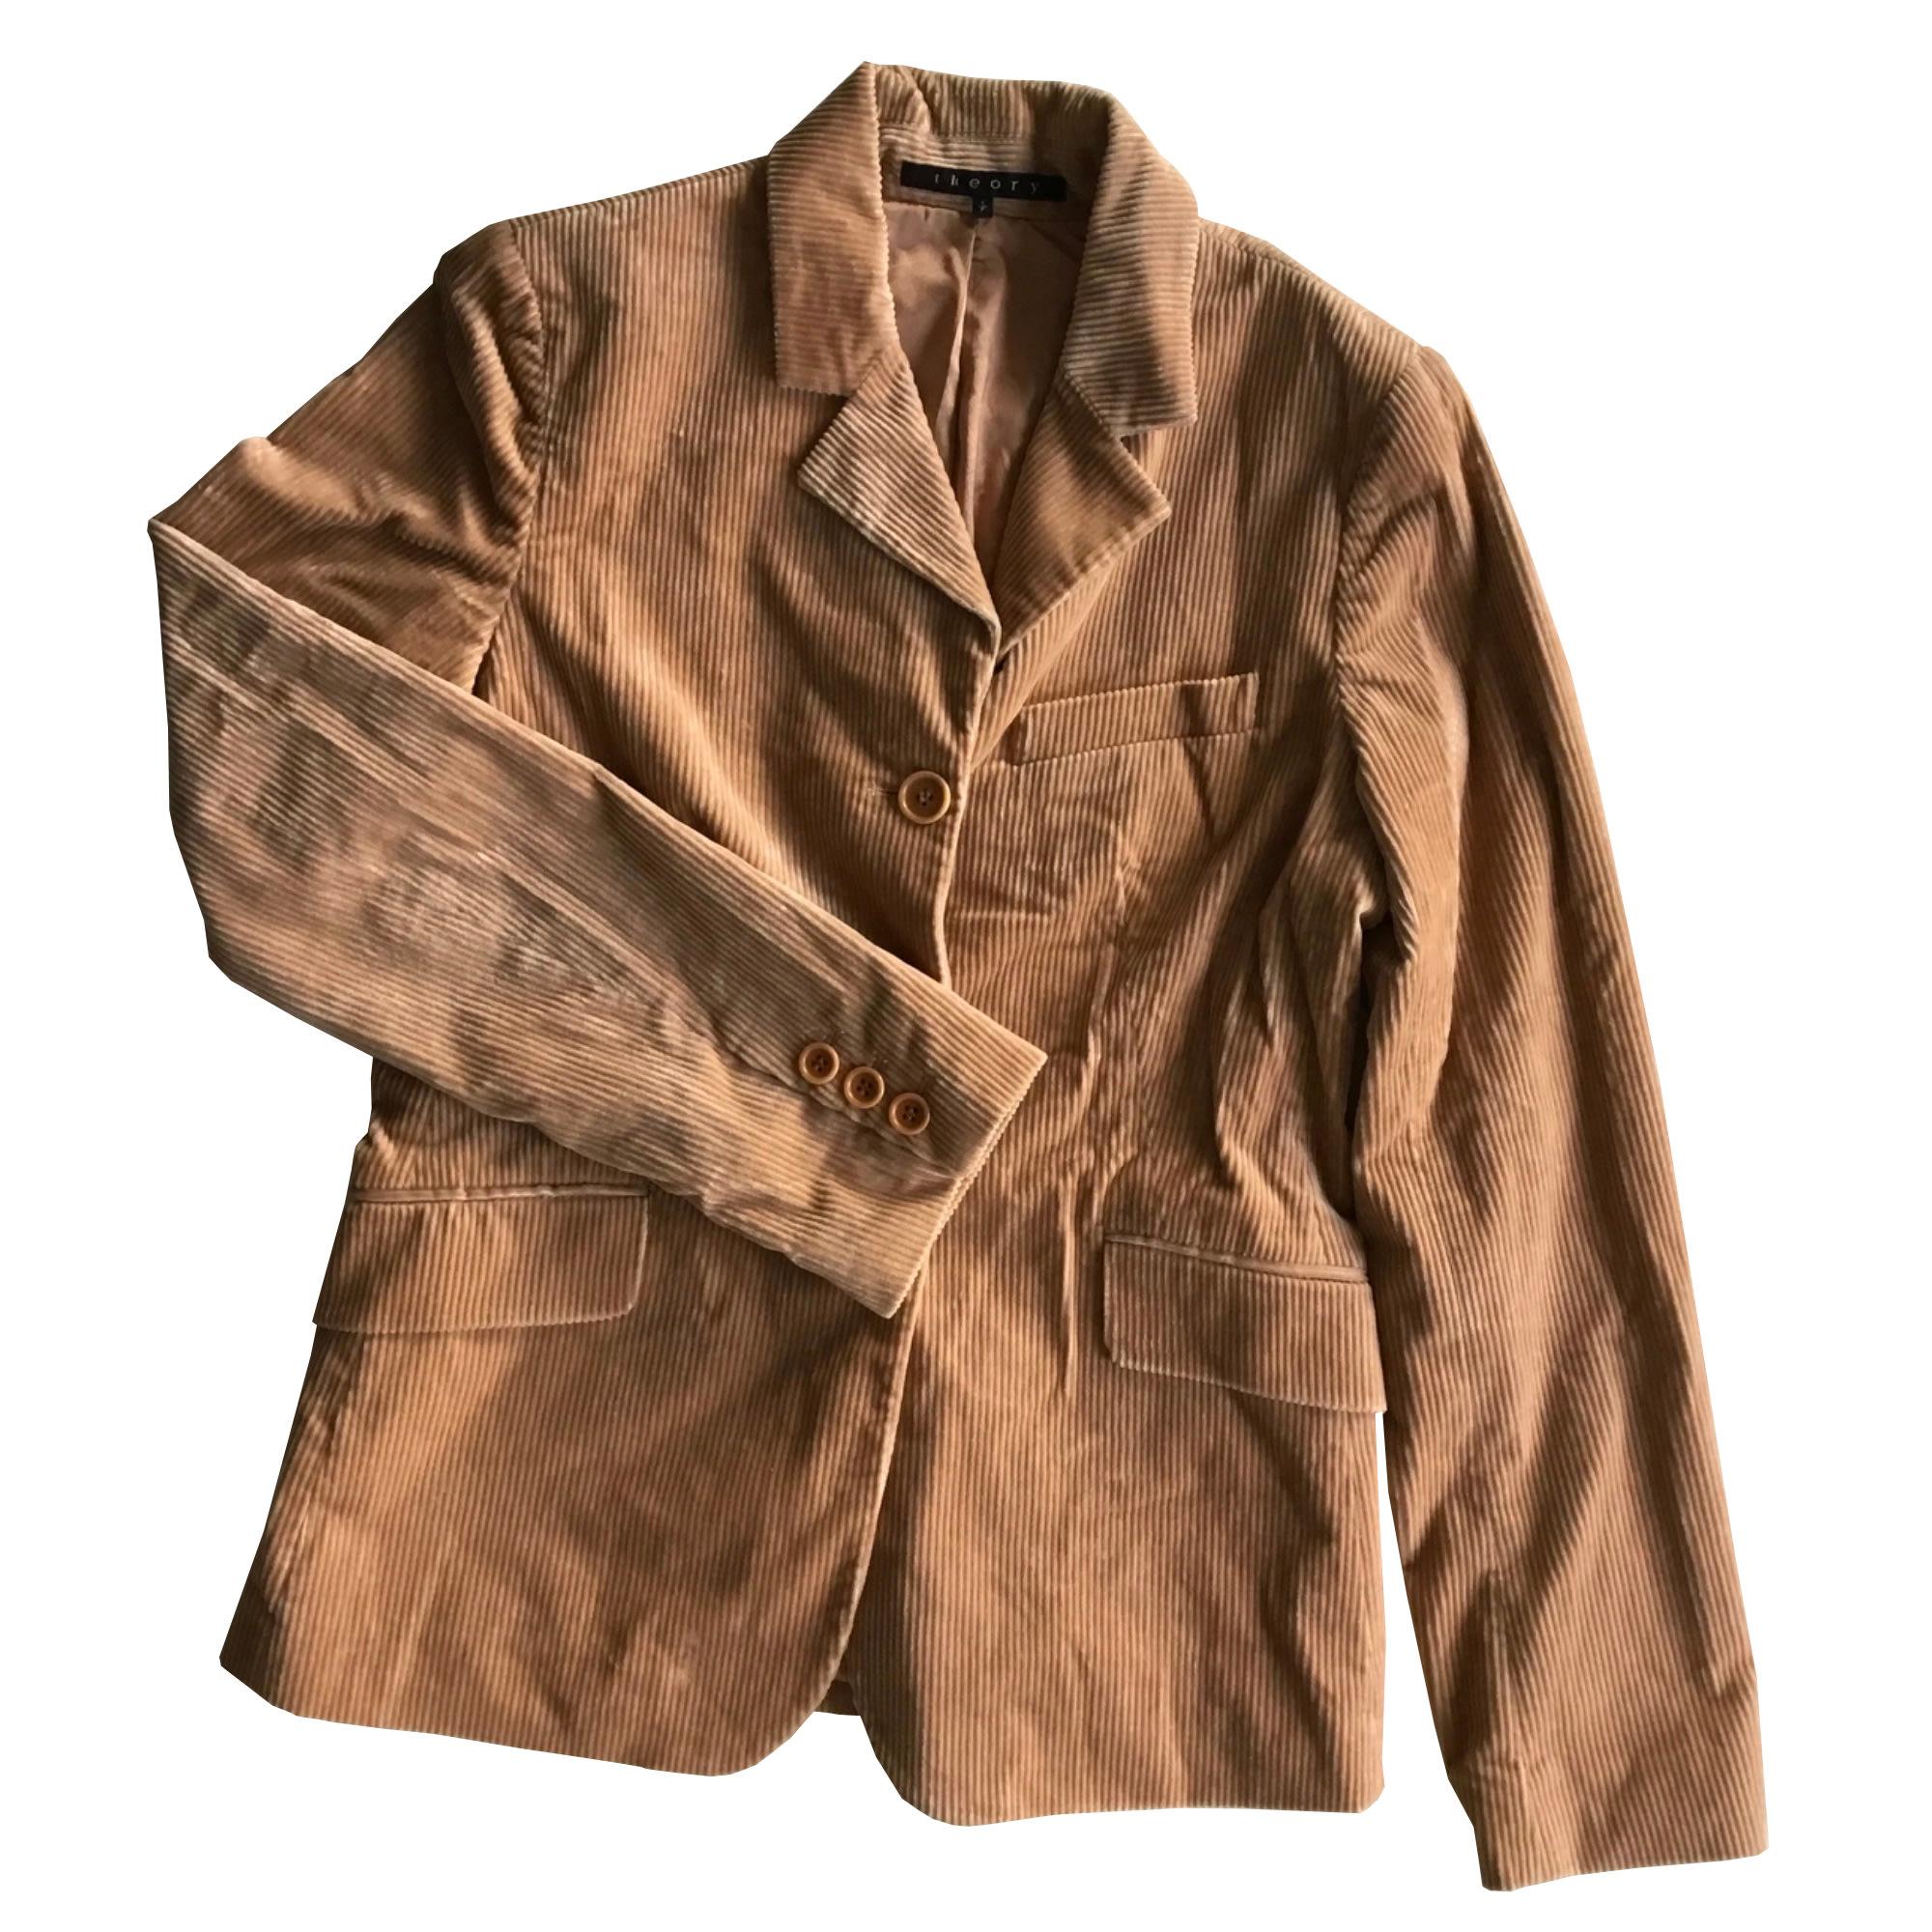 Blazer, veste tailleur THEORY Beige, camel